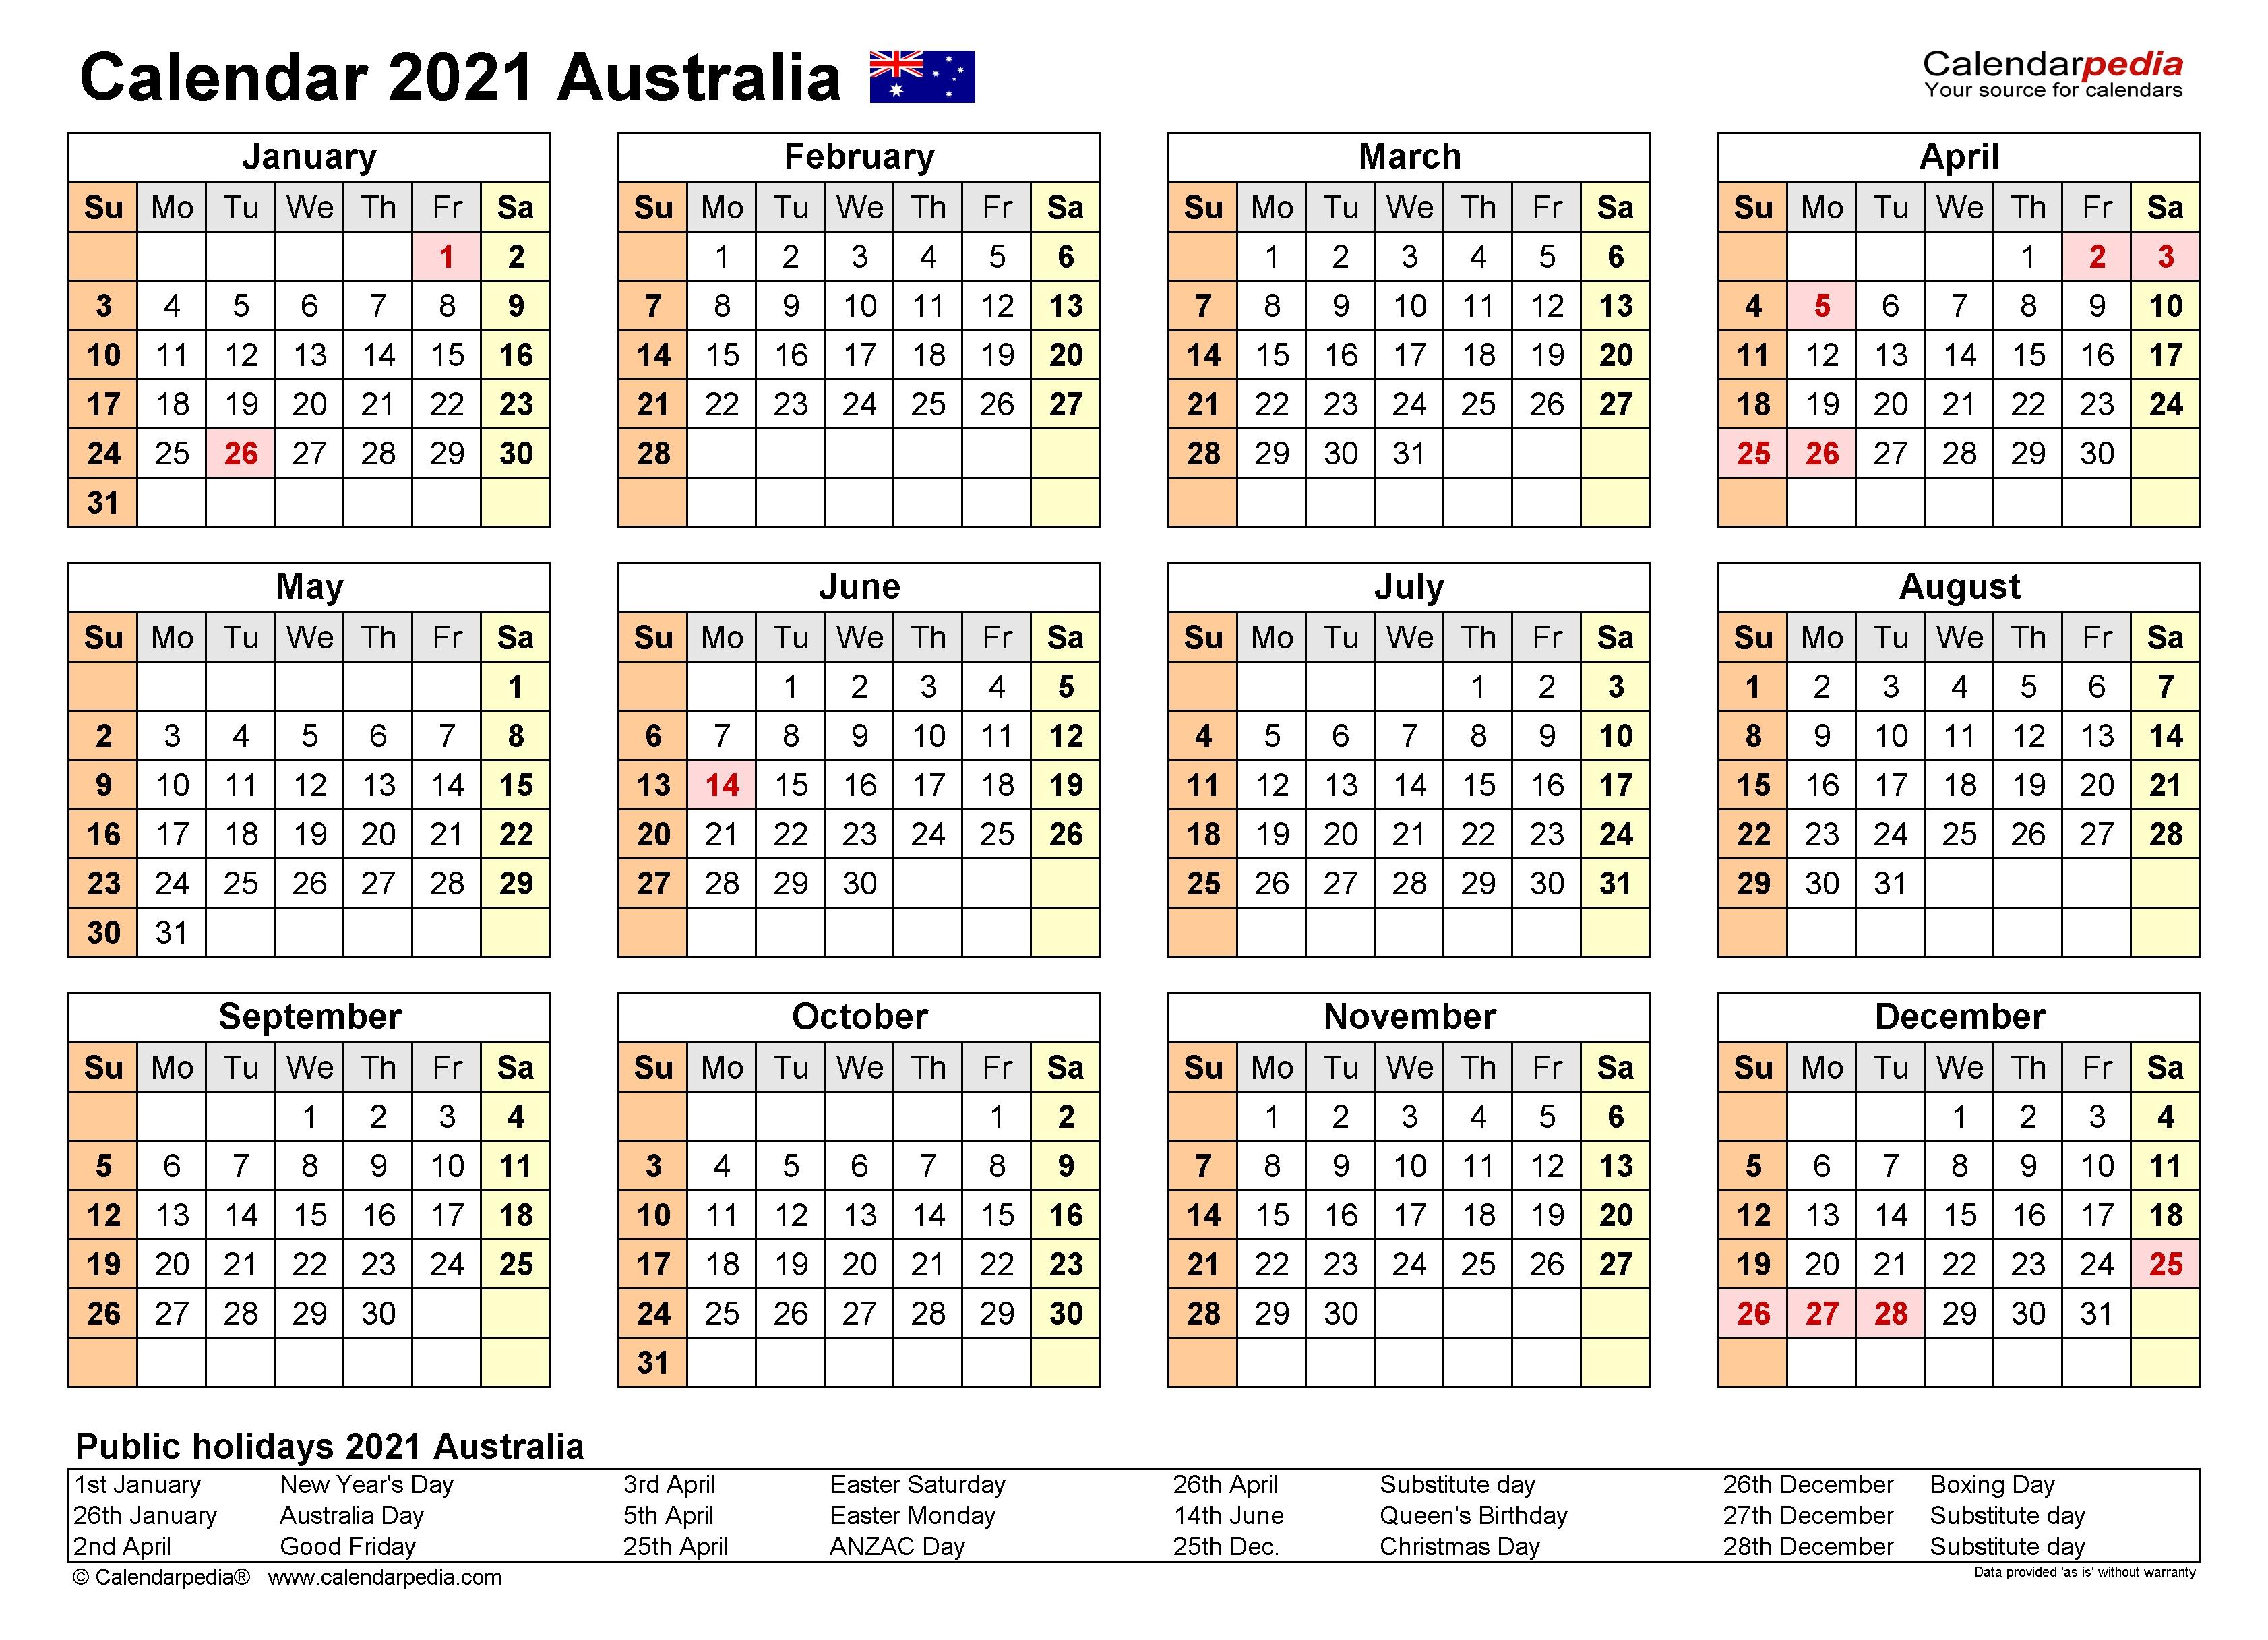 Australia Calendar 2021 - Free Printable Excel Templates  Fy 18/19 Calendar Australia